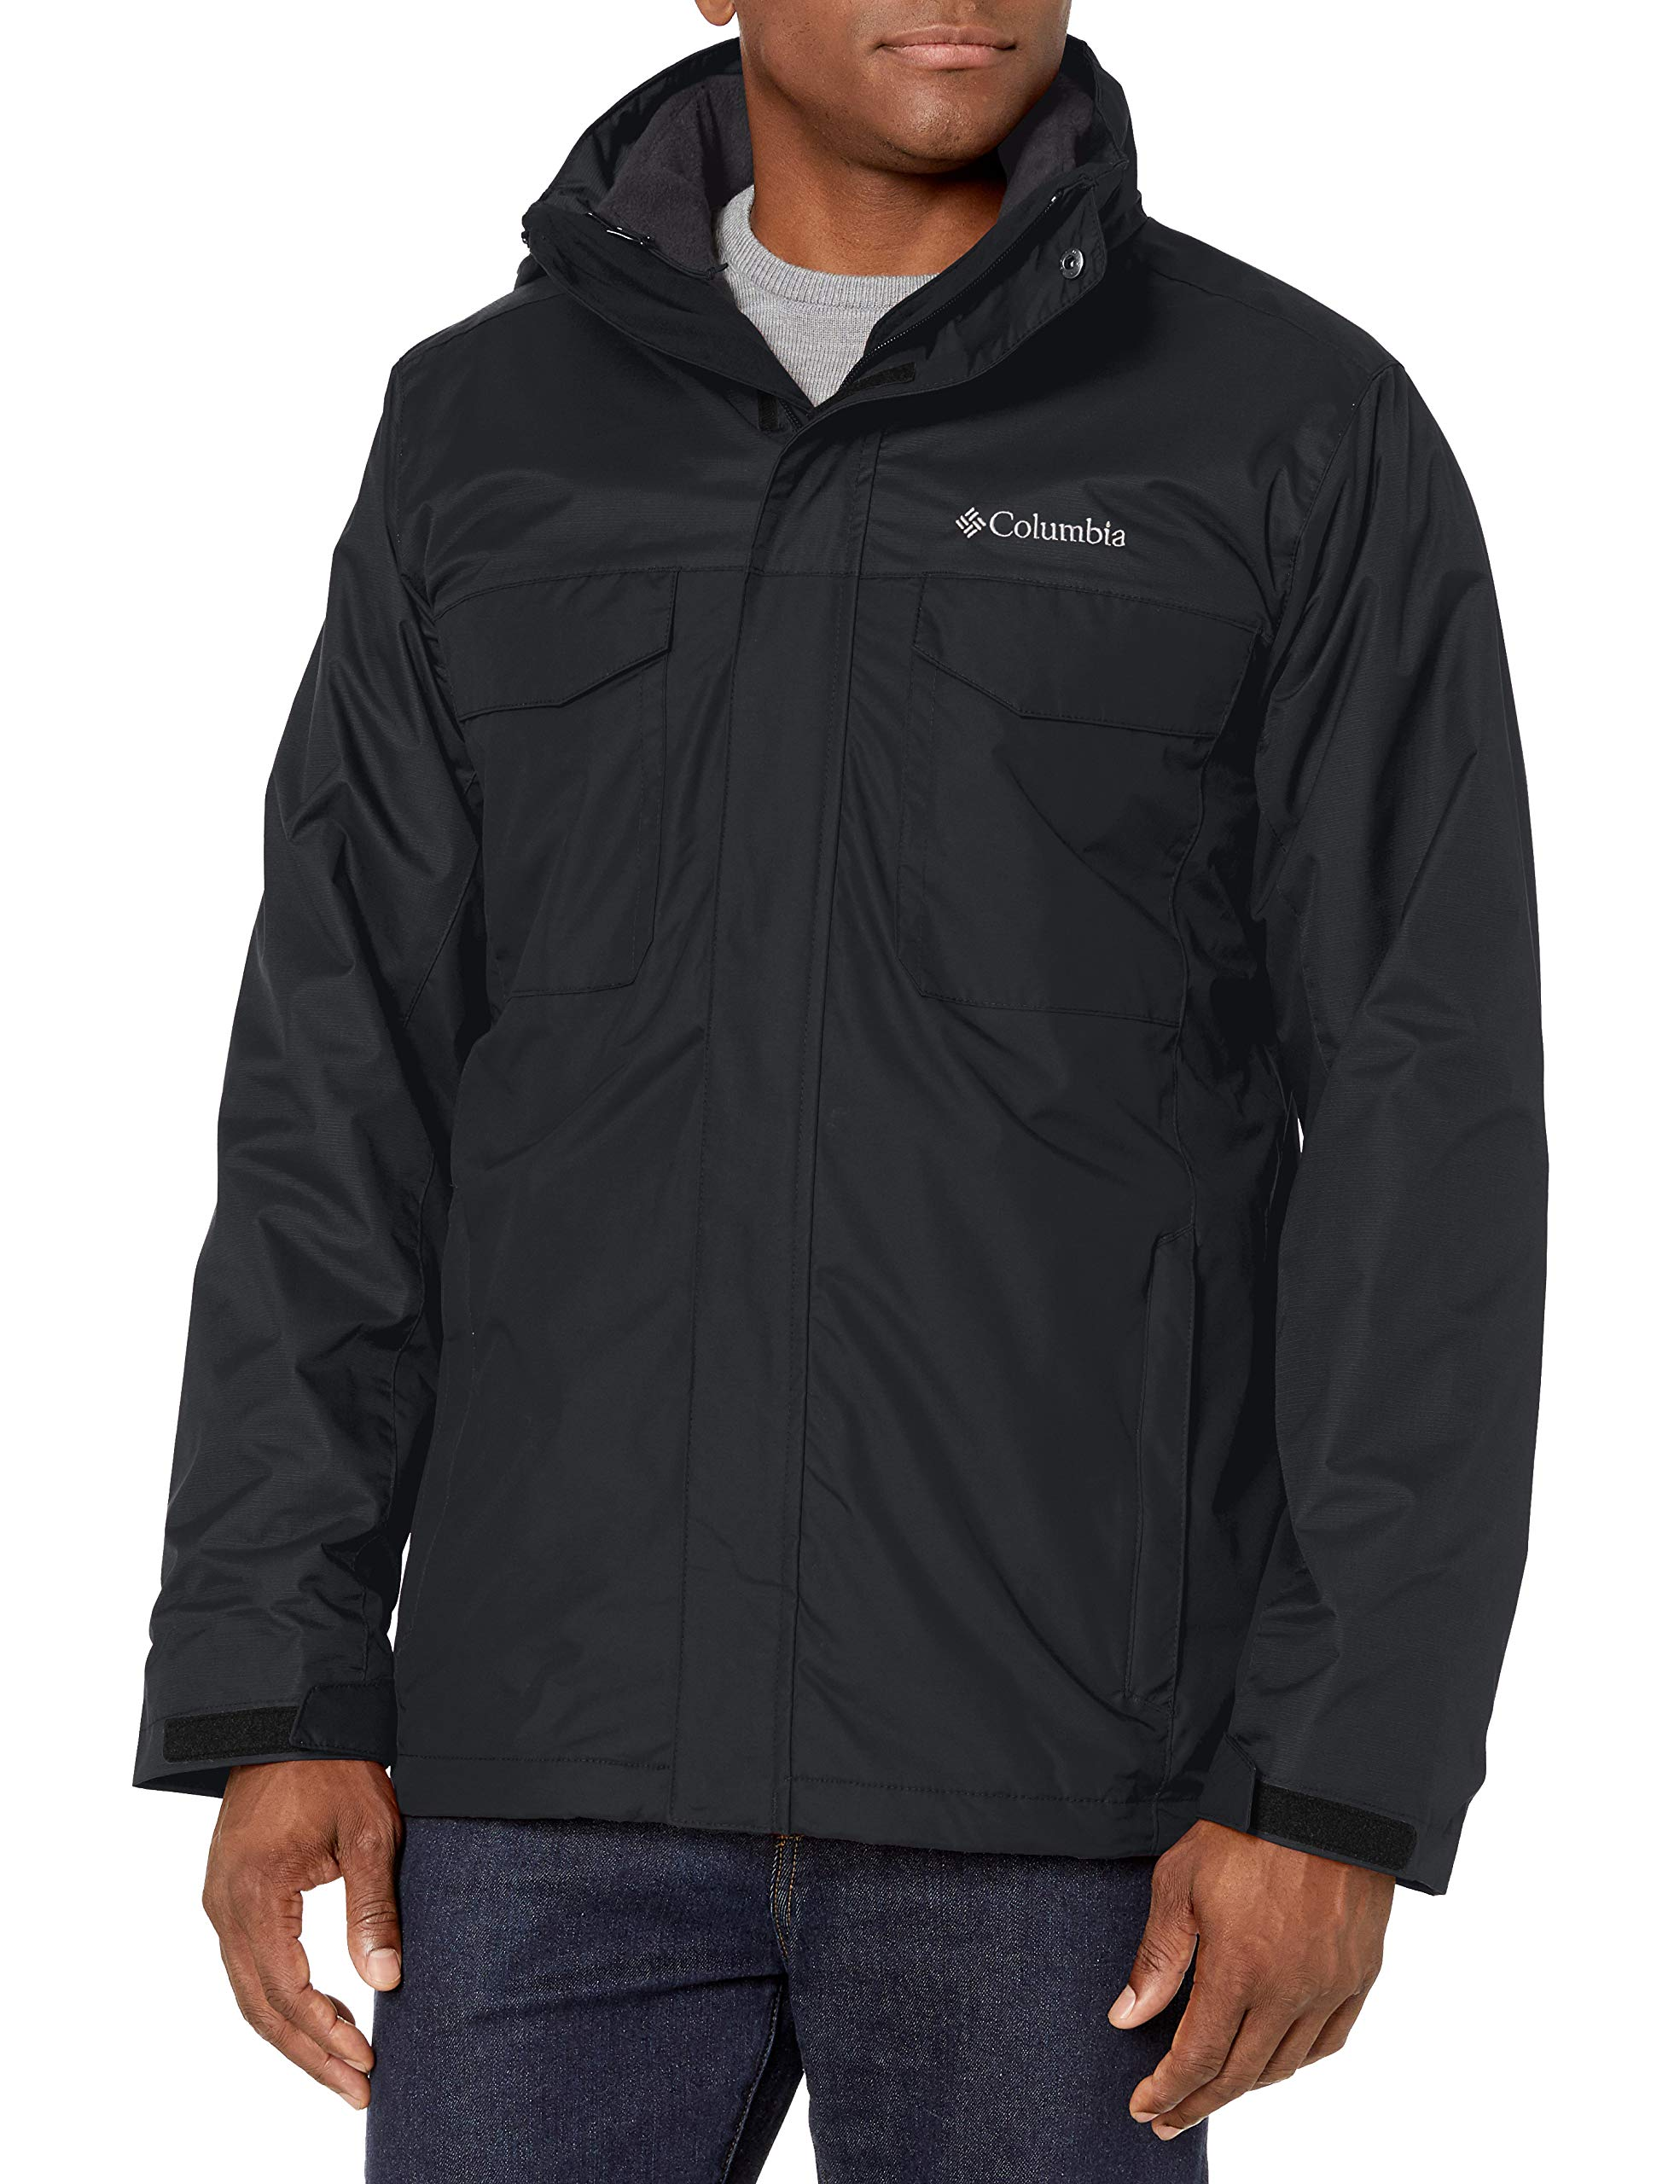 Columbia Men's Timberline Triple Interchange Jacket, Black, XX-Large by Columbia